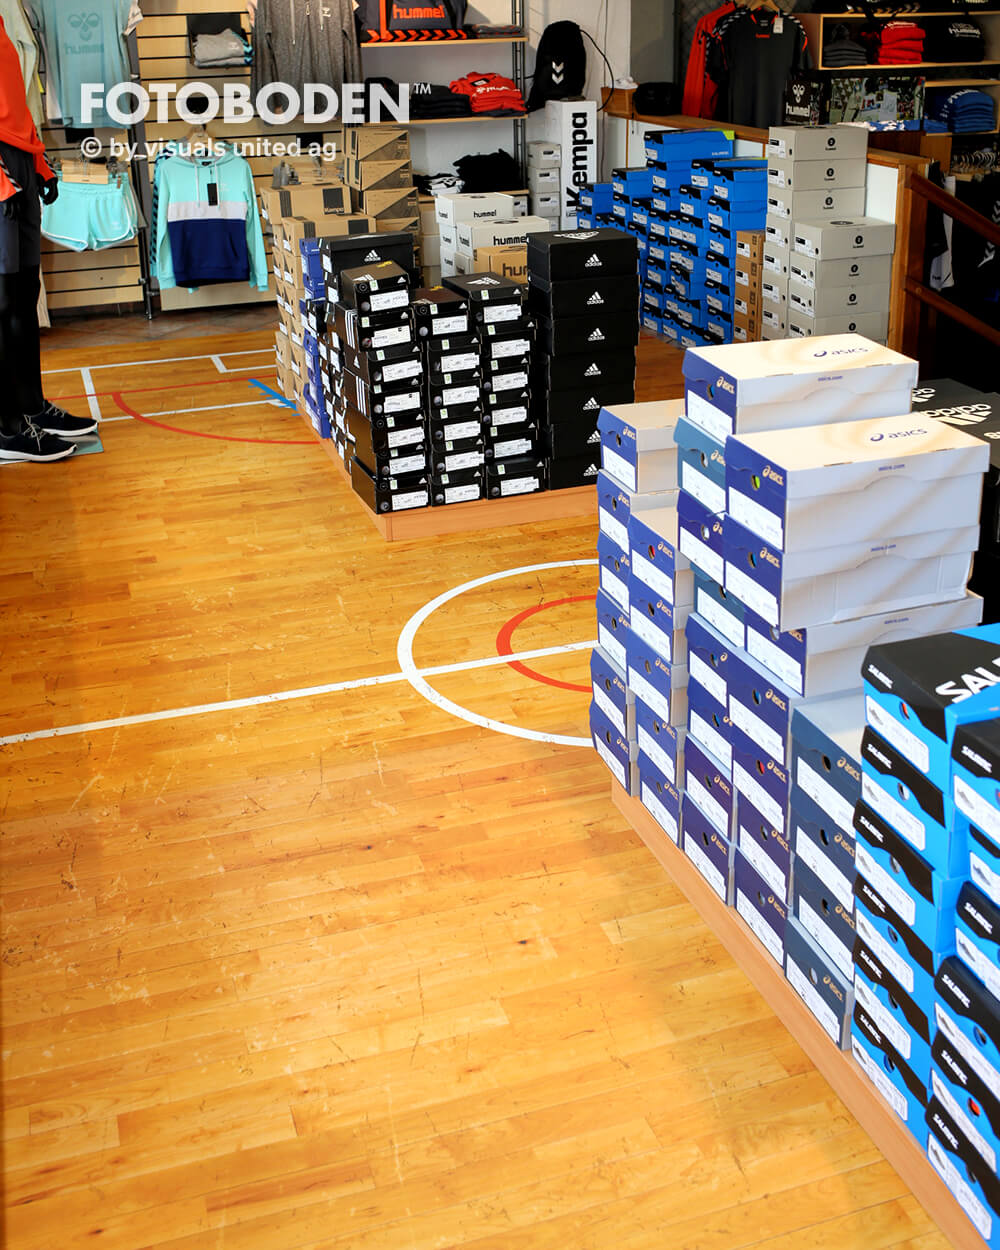 Sport7Ladenbau Ladengestaltung Fußboden Verkaufsfläche Bodengestaltung Boden Foto Fotoboden Fotomotiv Motiv Druck Visual Merchandising Point Of Sale POS